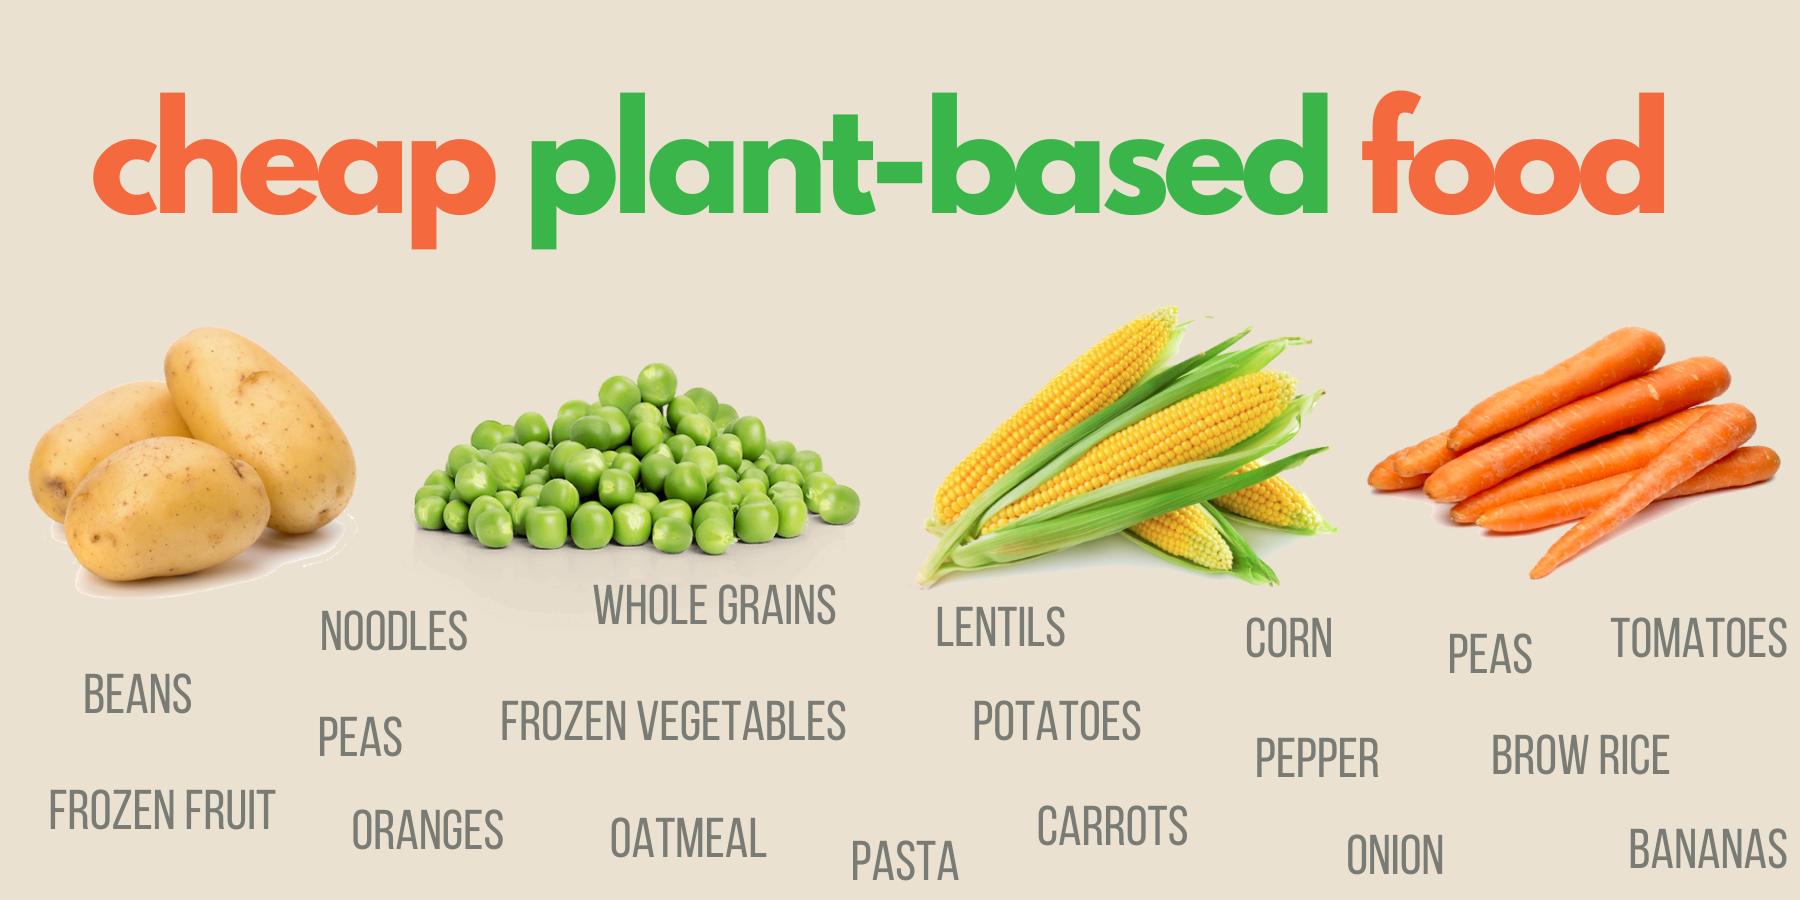 Cheap plant-based food list ideas